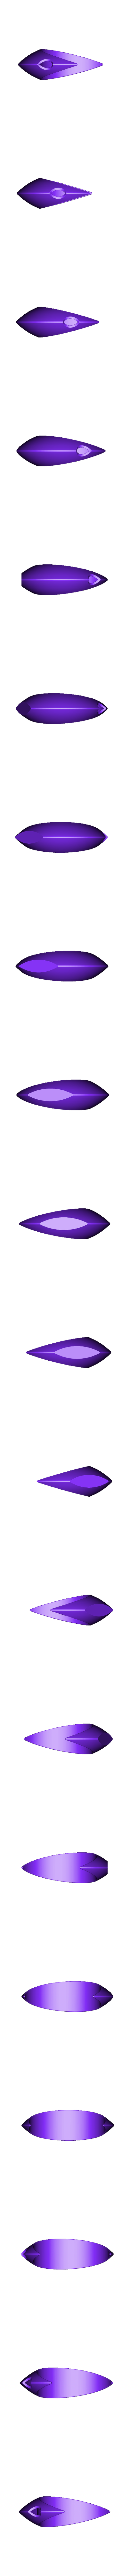 Moon 2.stl Download free STL file Minimalist Moon Vase • Object to 3D print, skelei